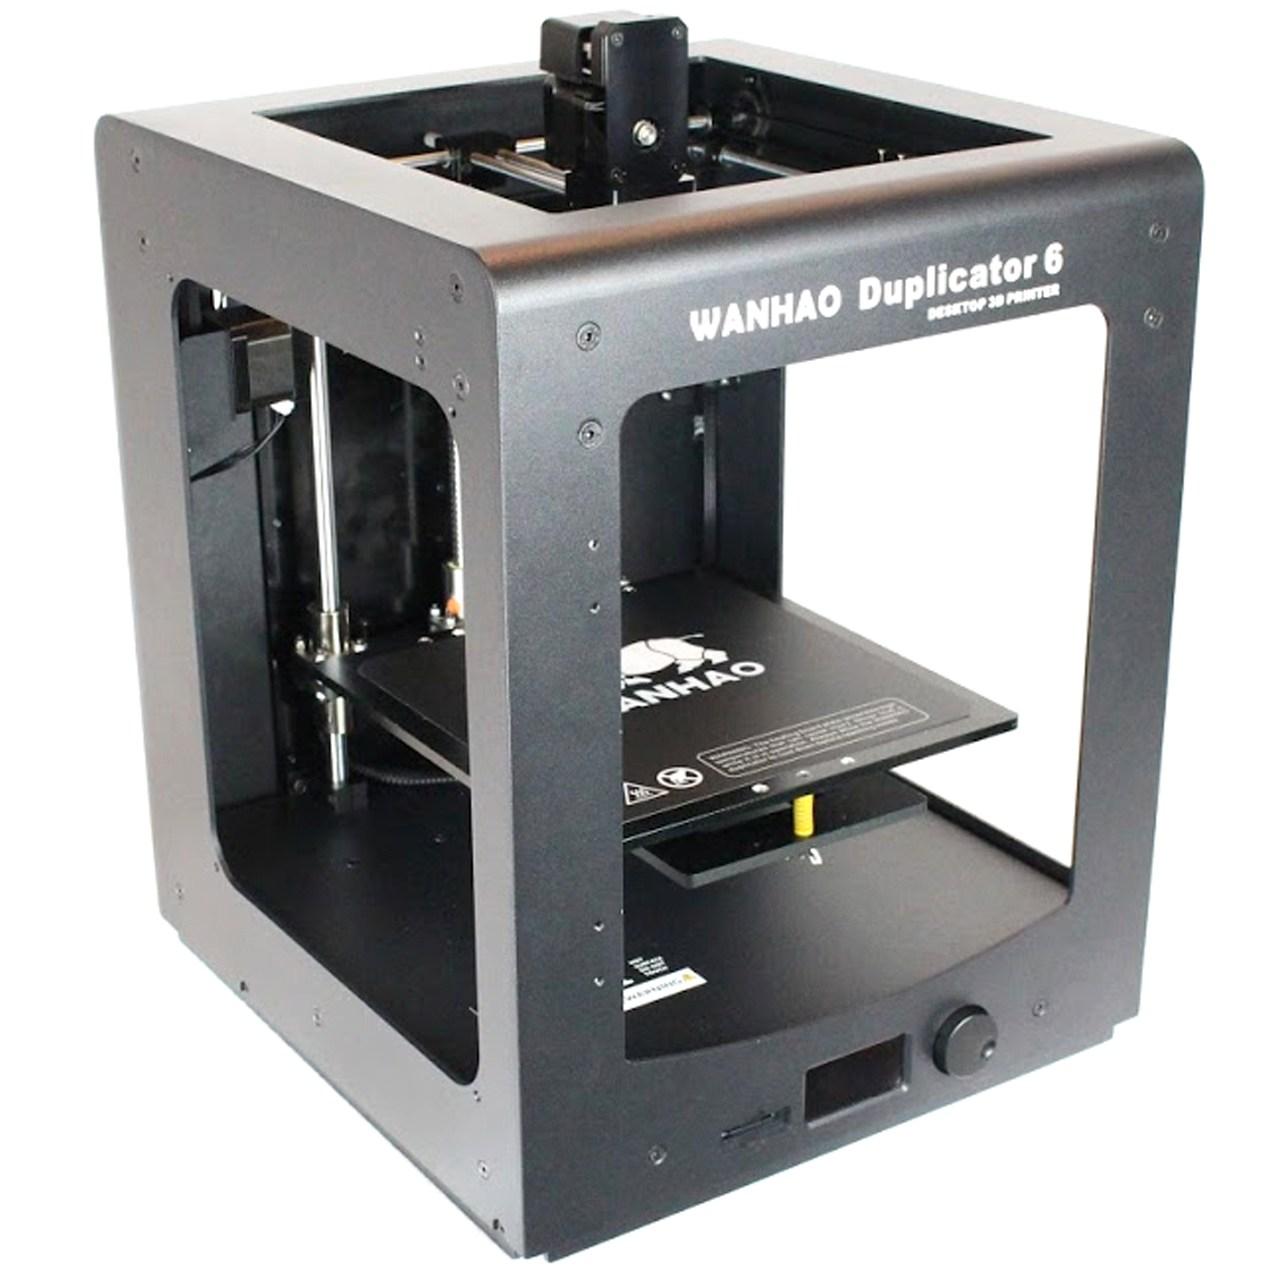 پرینتر سهبعدی ونهاو مدل Duplicator D6